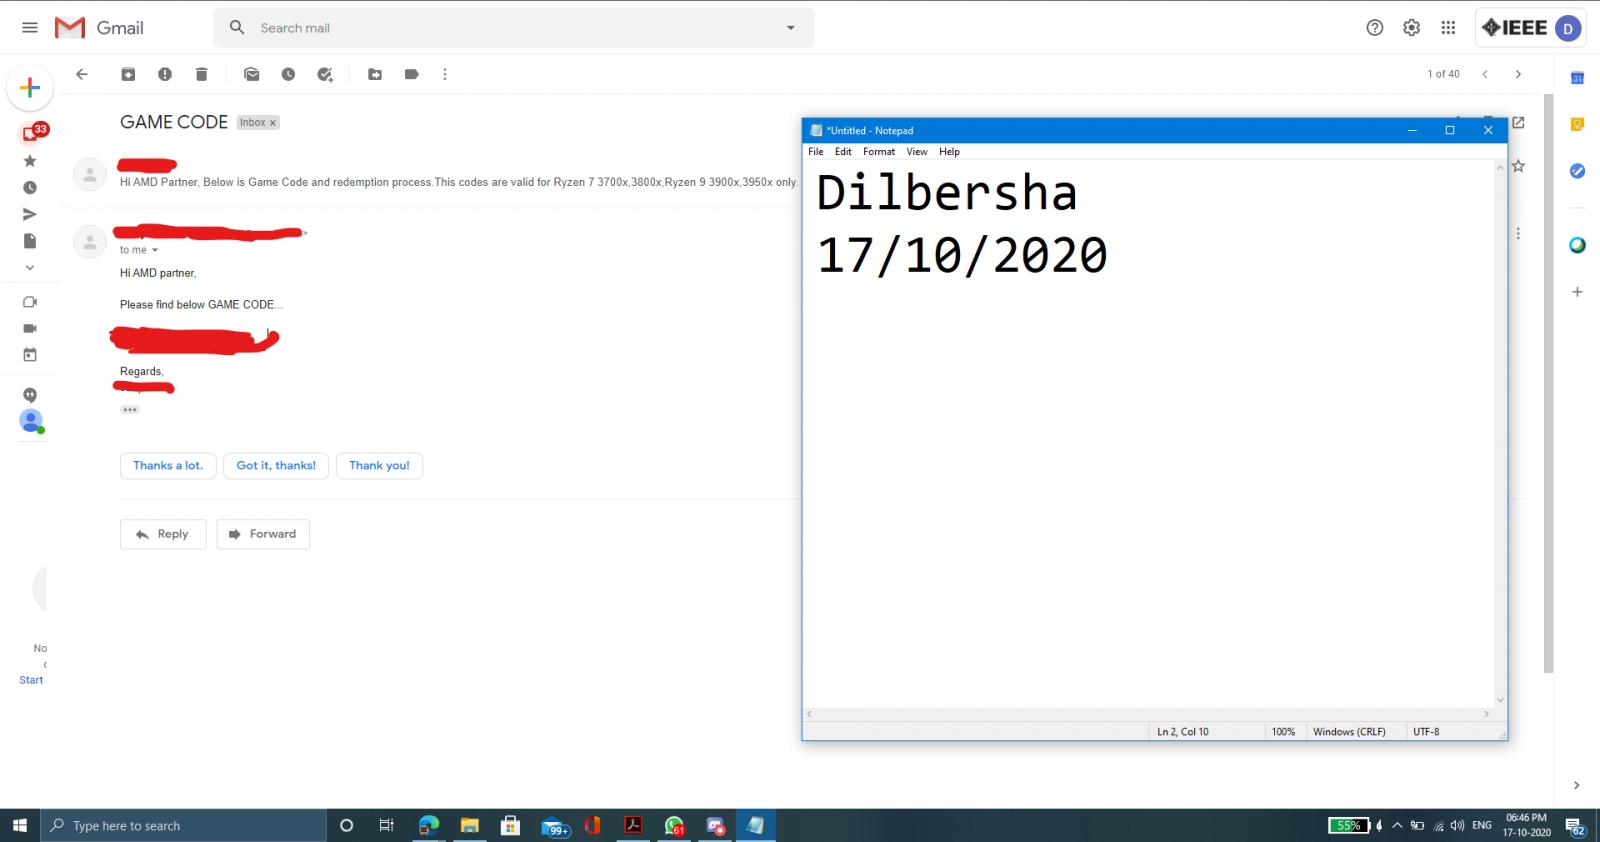 Screenshot 2020-10-17 184729.png